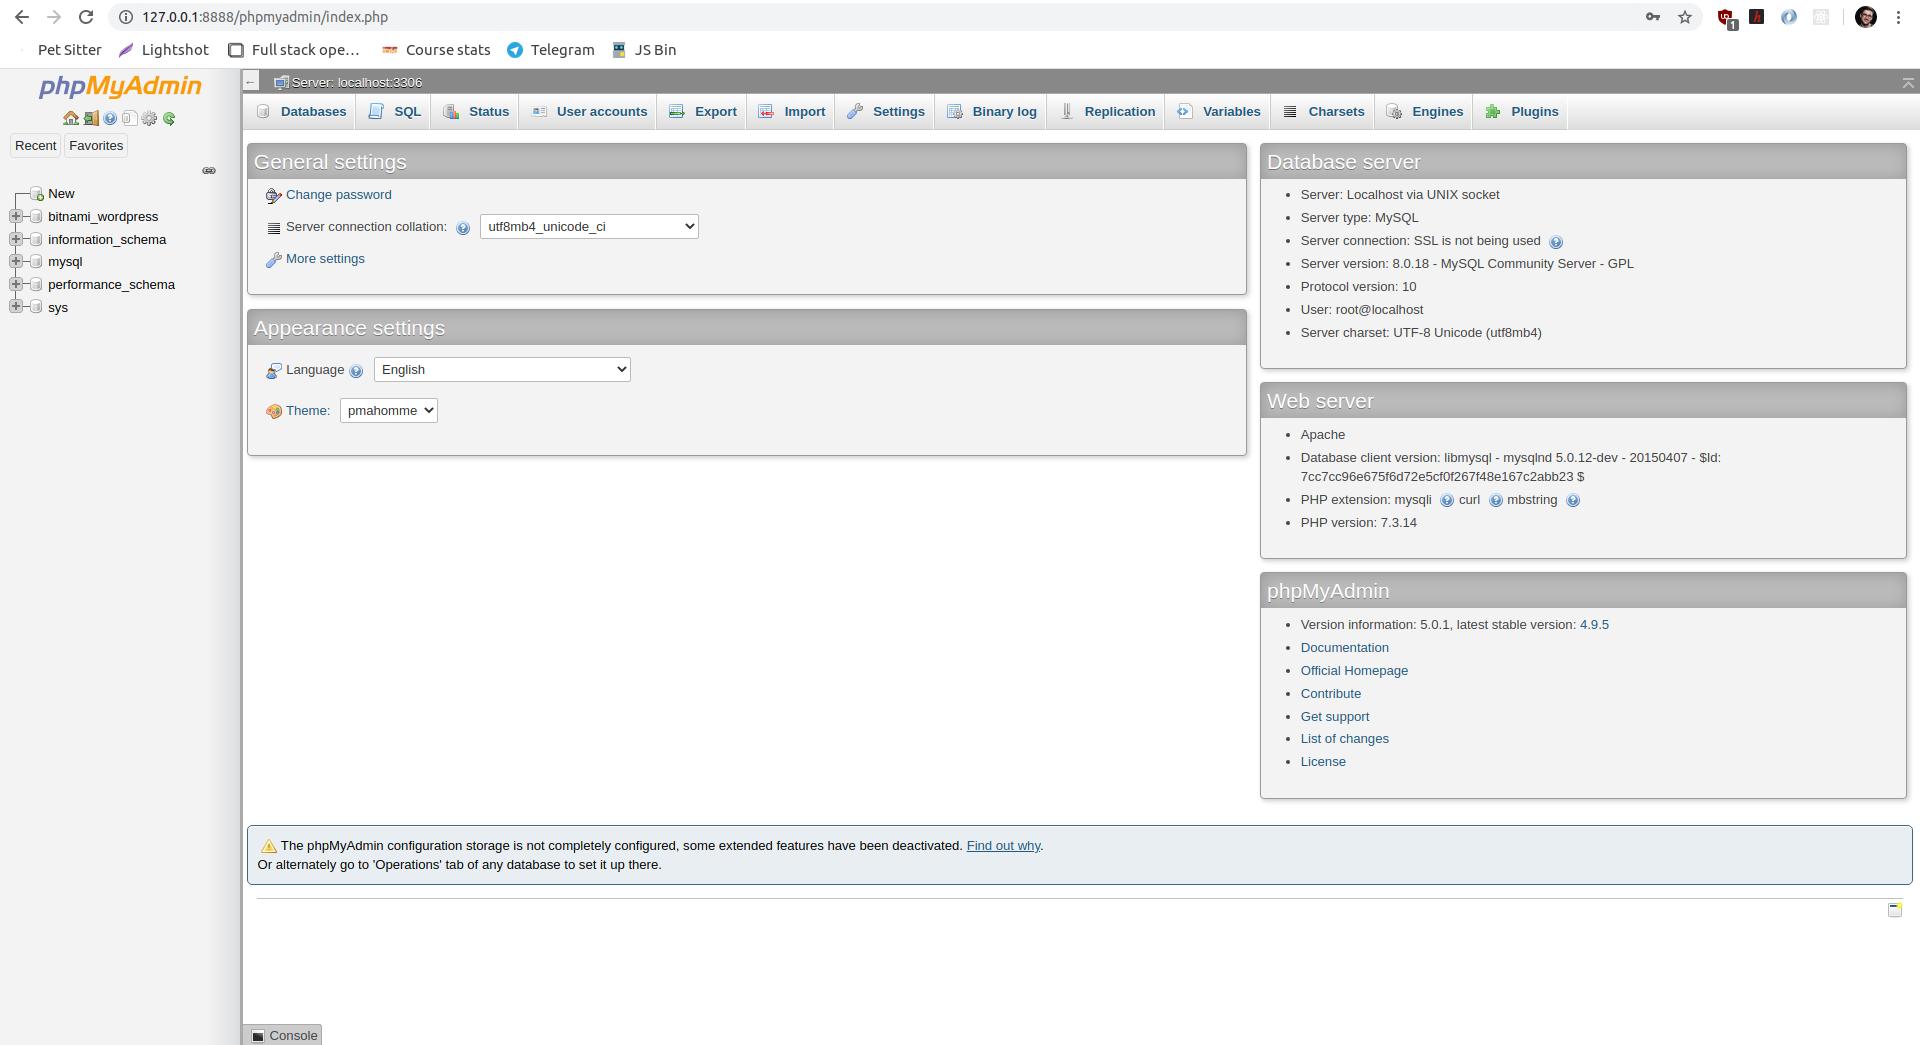 phpMyAdmin Access Granted